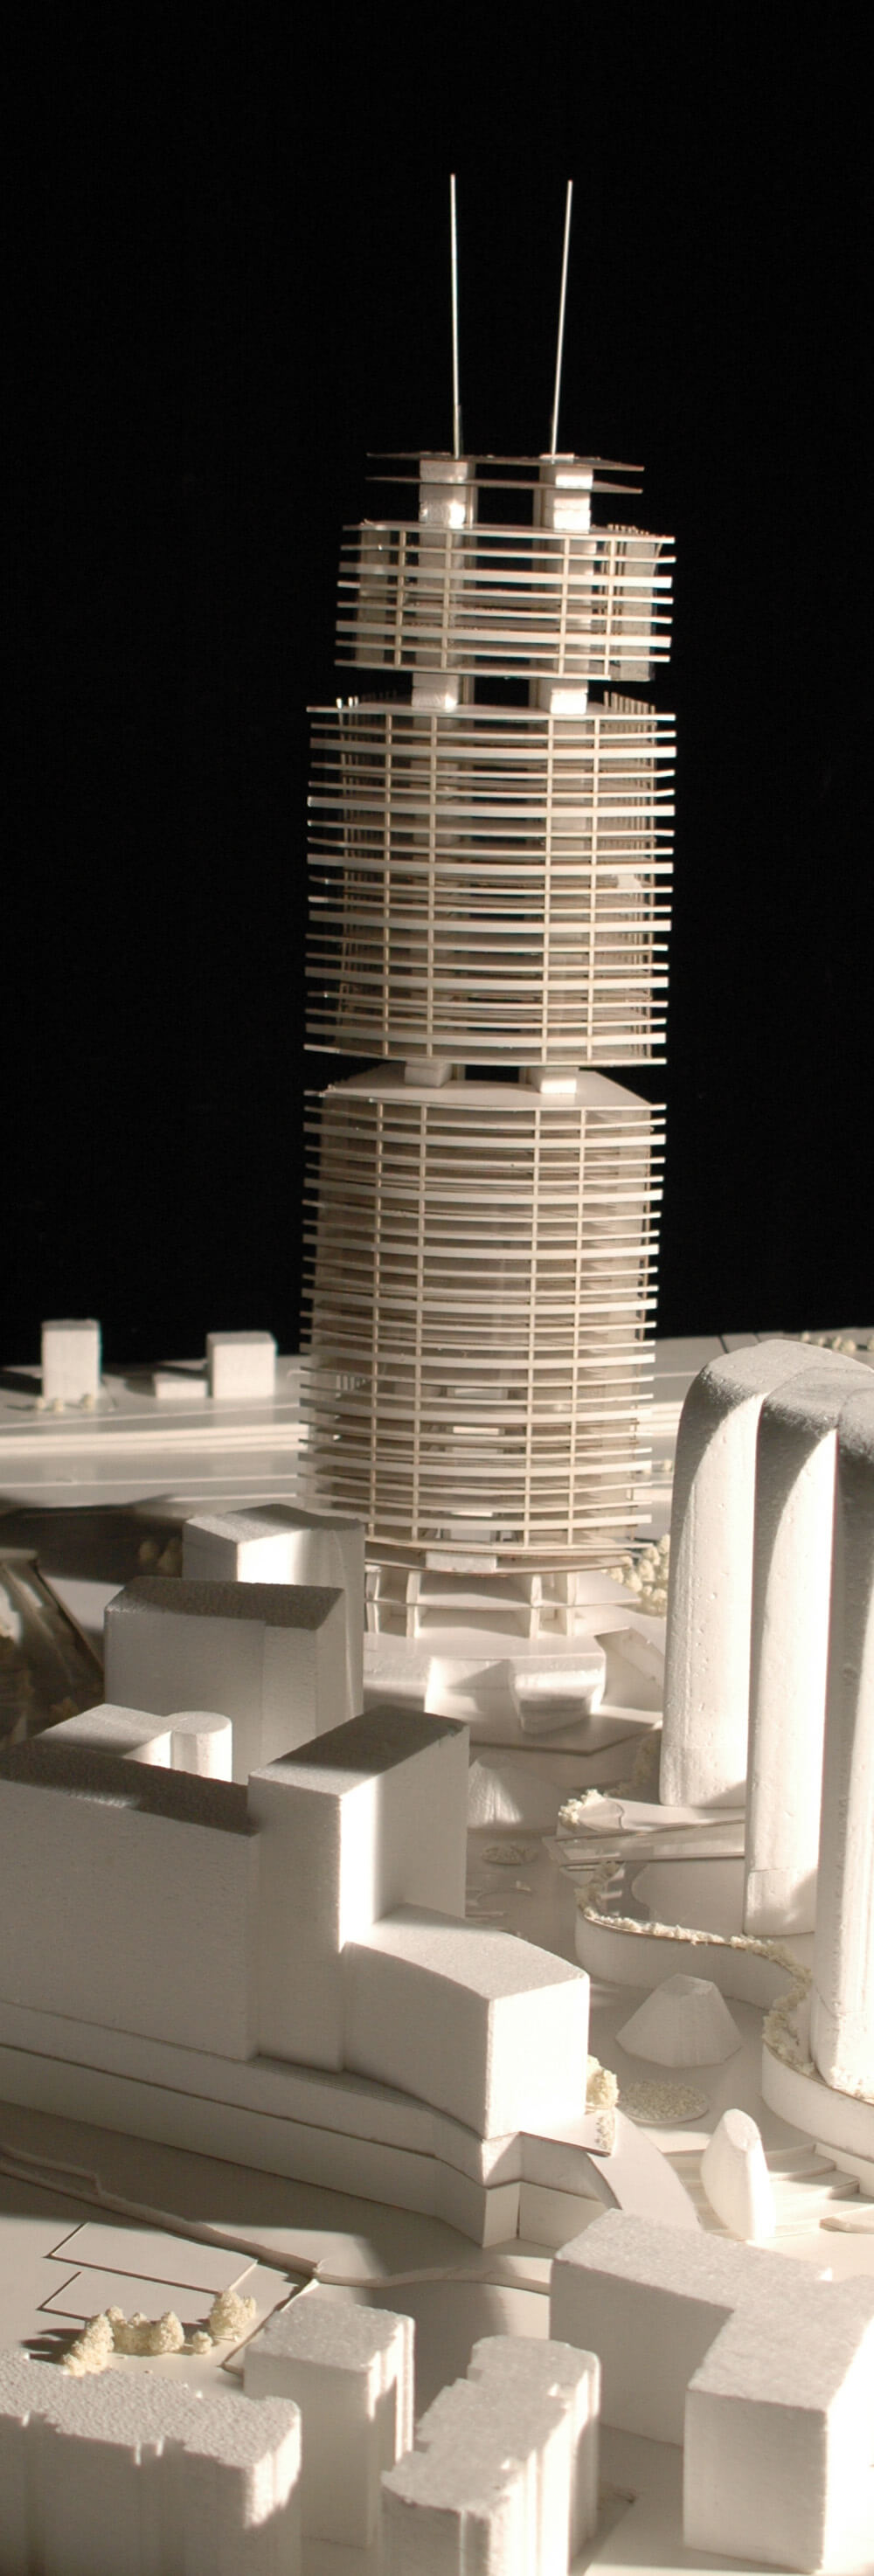 09-03-27_Final_Concept_Design_Report9